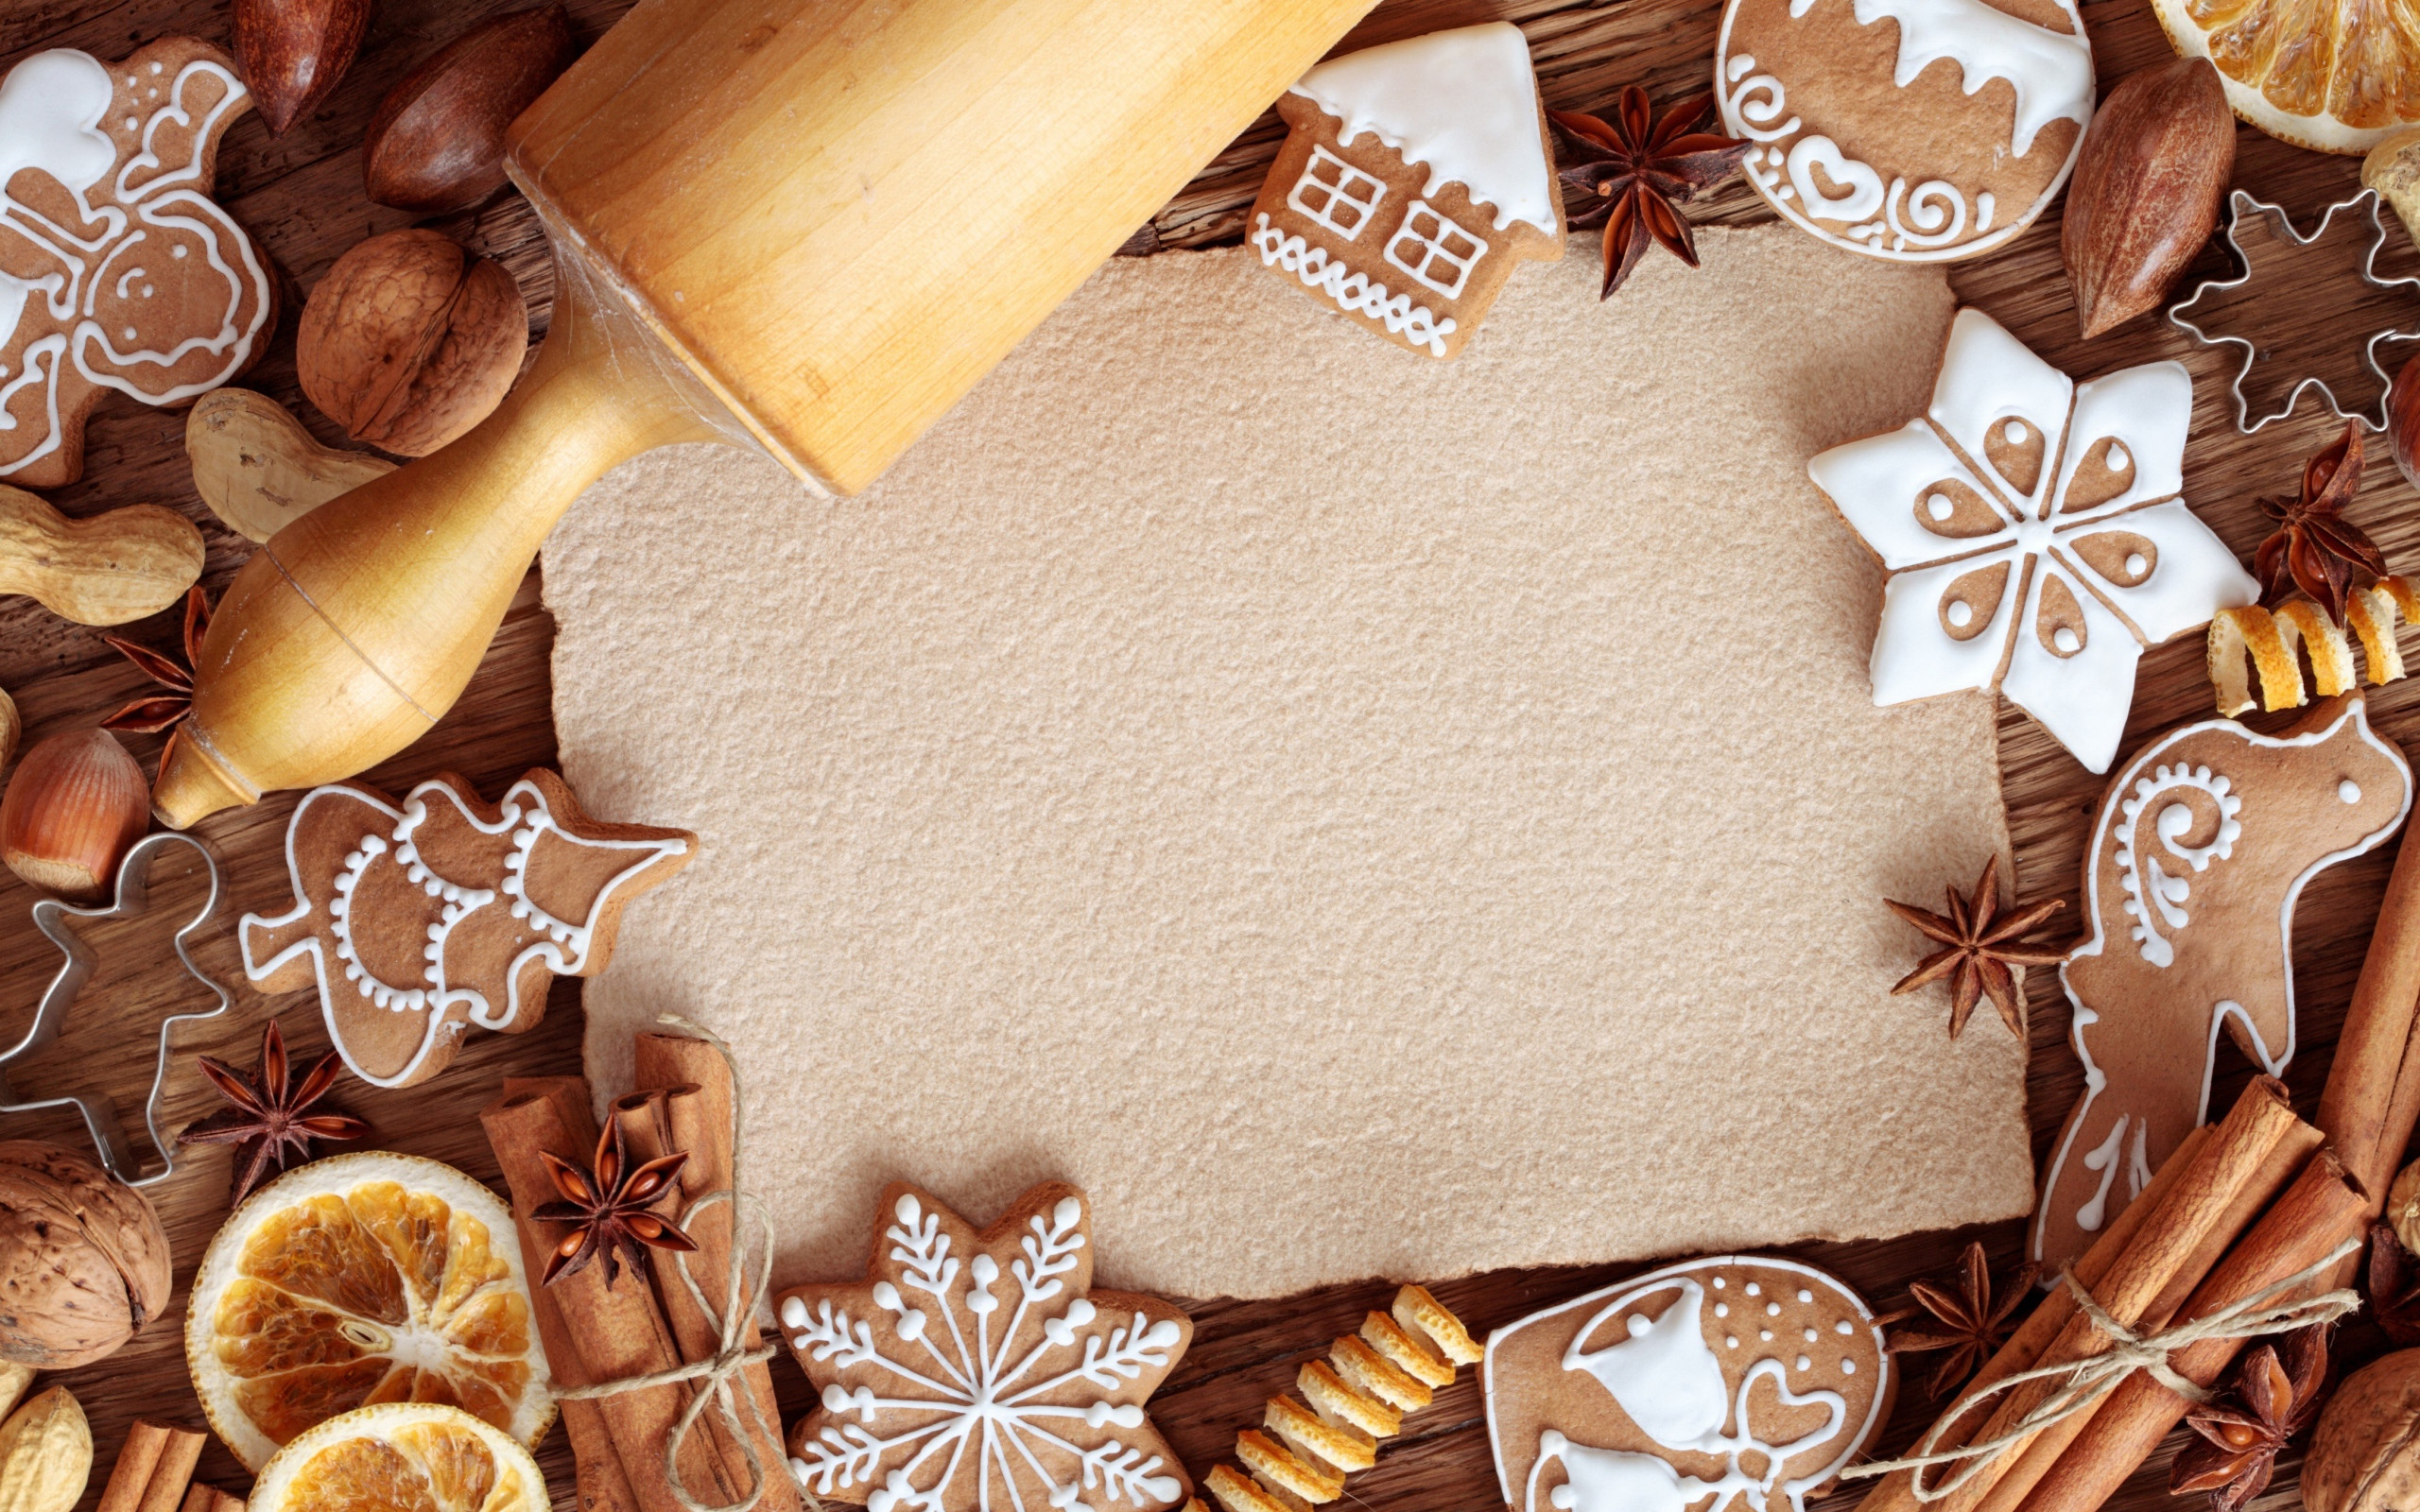 Christmas Cookies Wallpaper  Preparation of Christmas cookies Desktop wallpapers